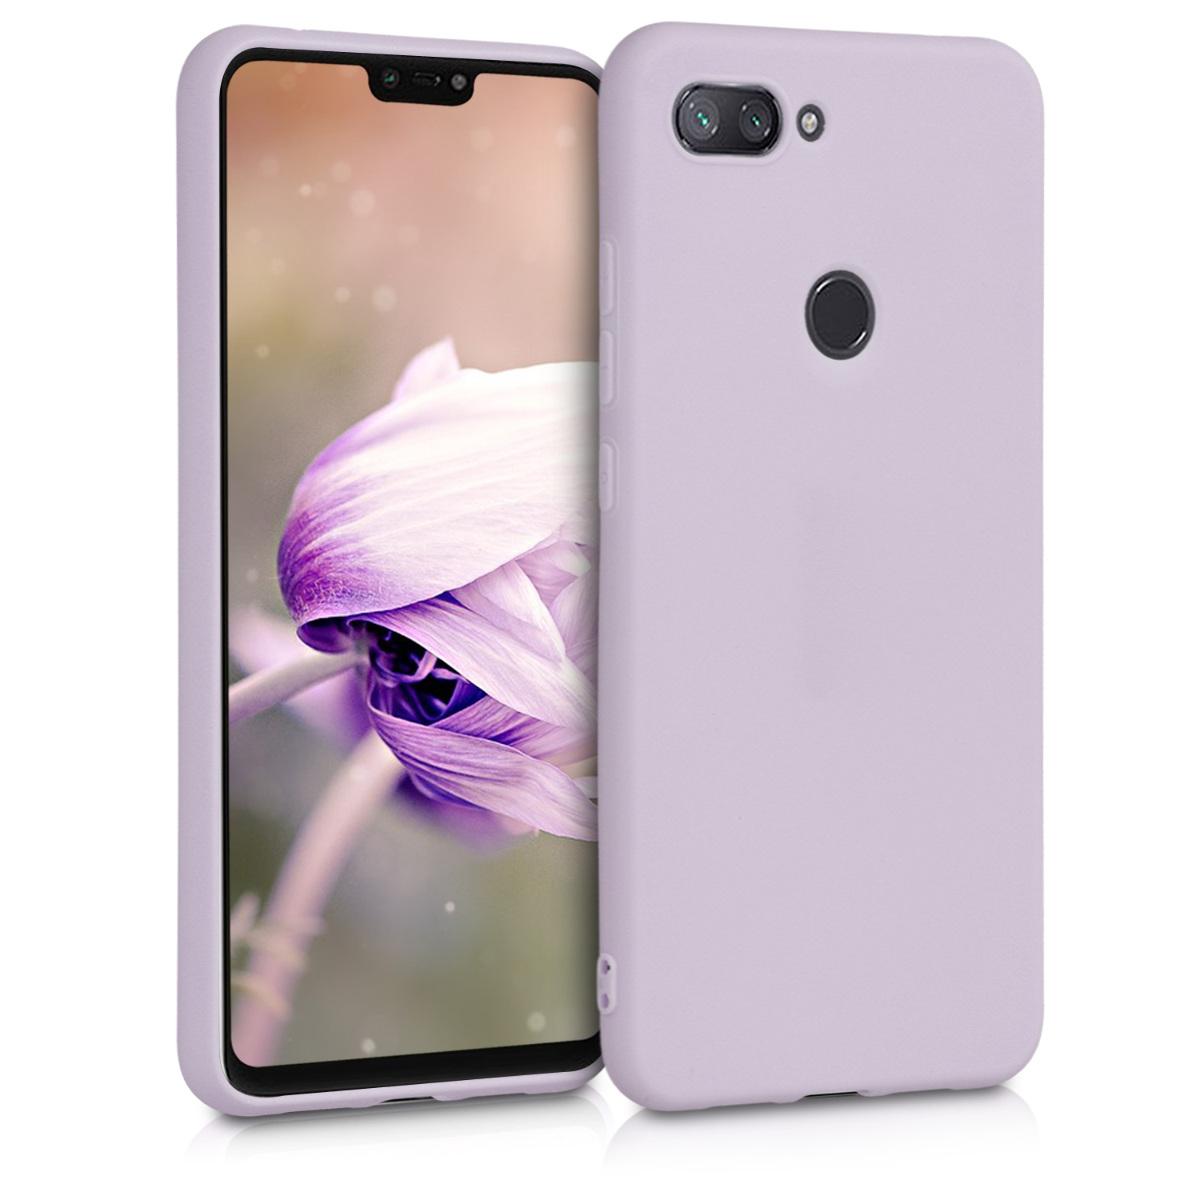 KW Θήκη Σιλικόνης Xiaomi Mi 8 Lite - Lavender (46451.108)